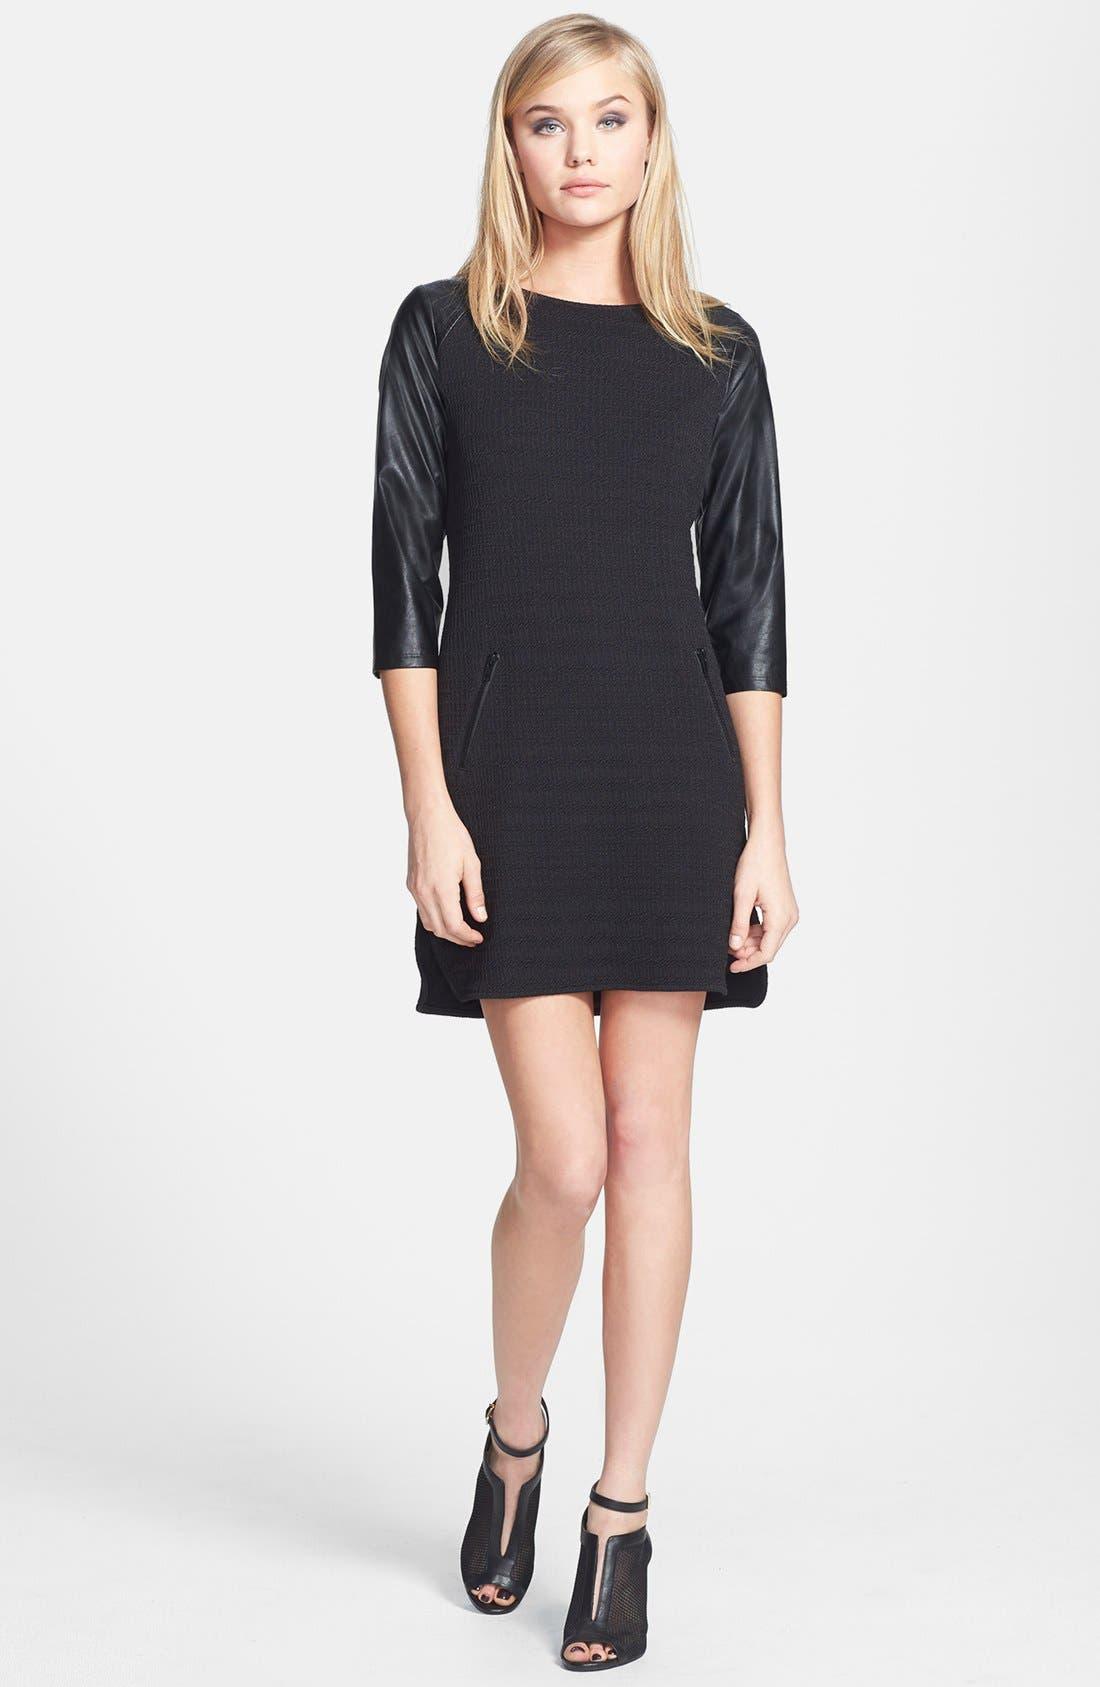 Alternate Image 1 Selected - Sanctuary Faux Leather Sleeve Shift Dress